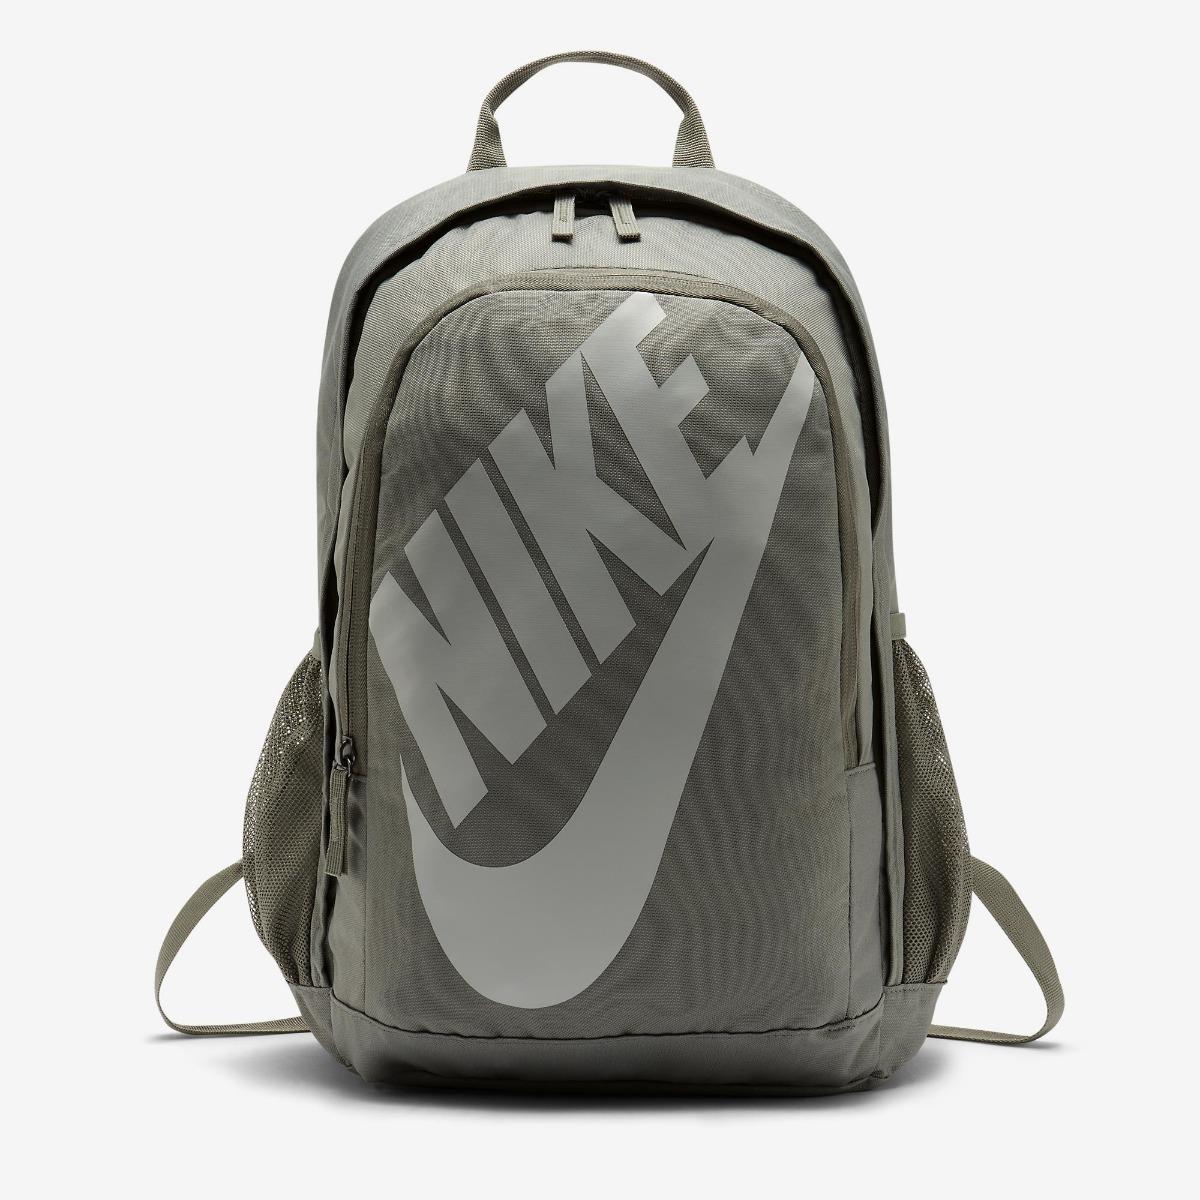 4197a2304 mochila nike hayward futura 2.0 - mochila escolar - cinza. Carregando zoom.